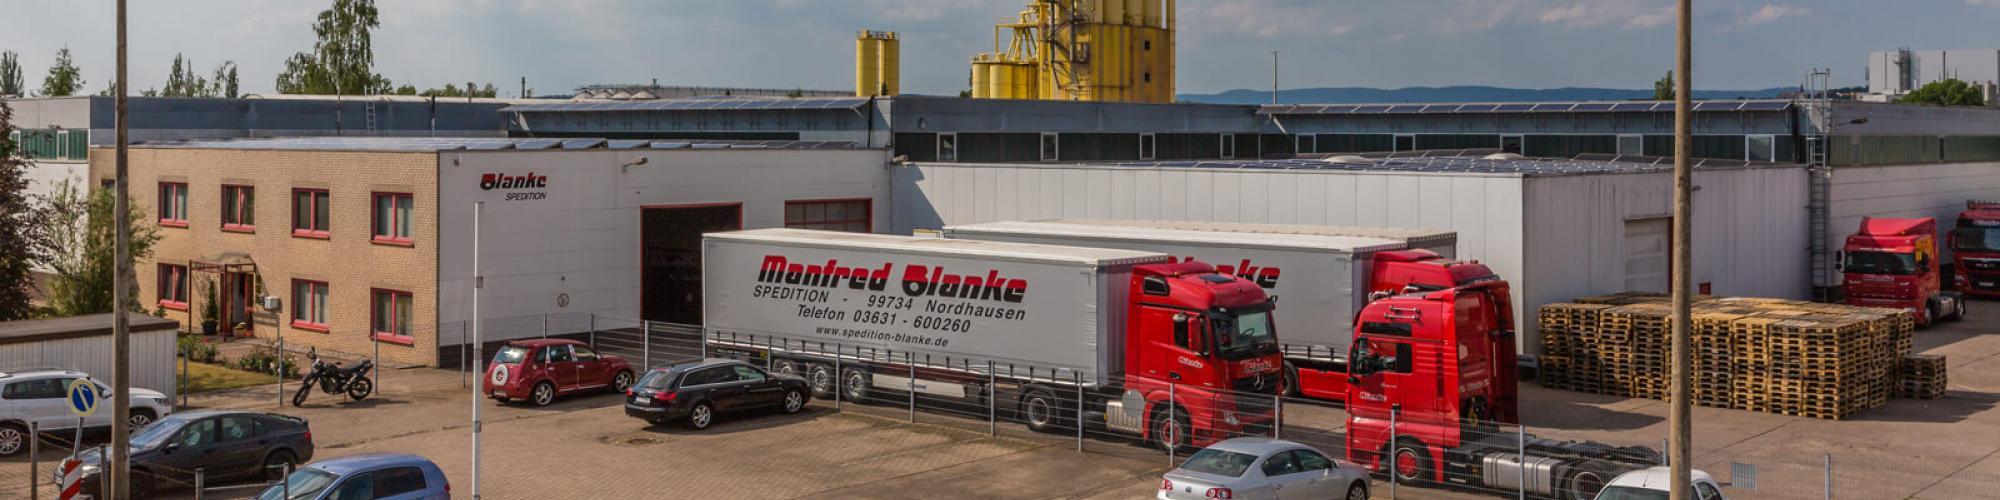 Blanke GmbH Spedition - Systemlogistik